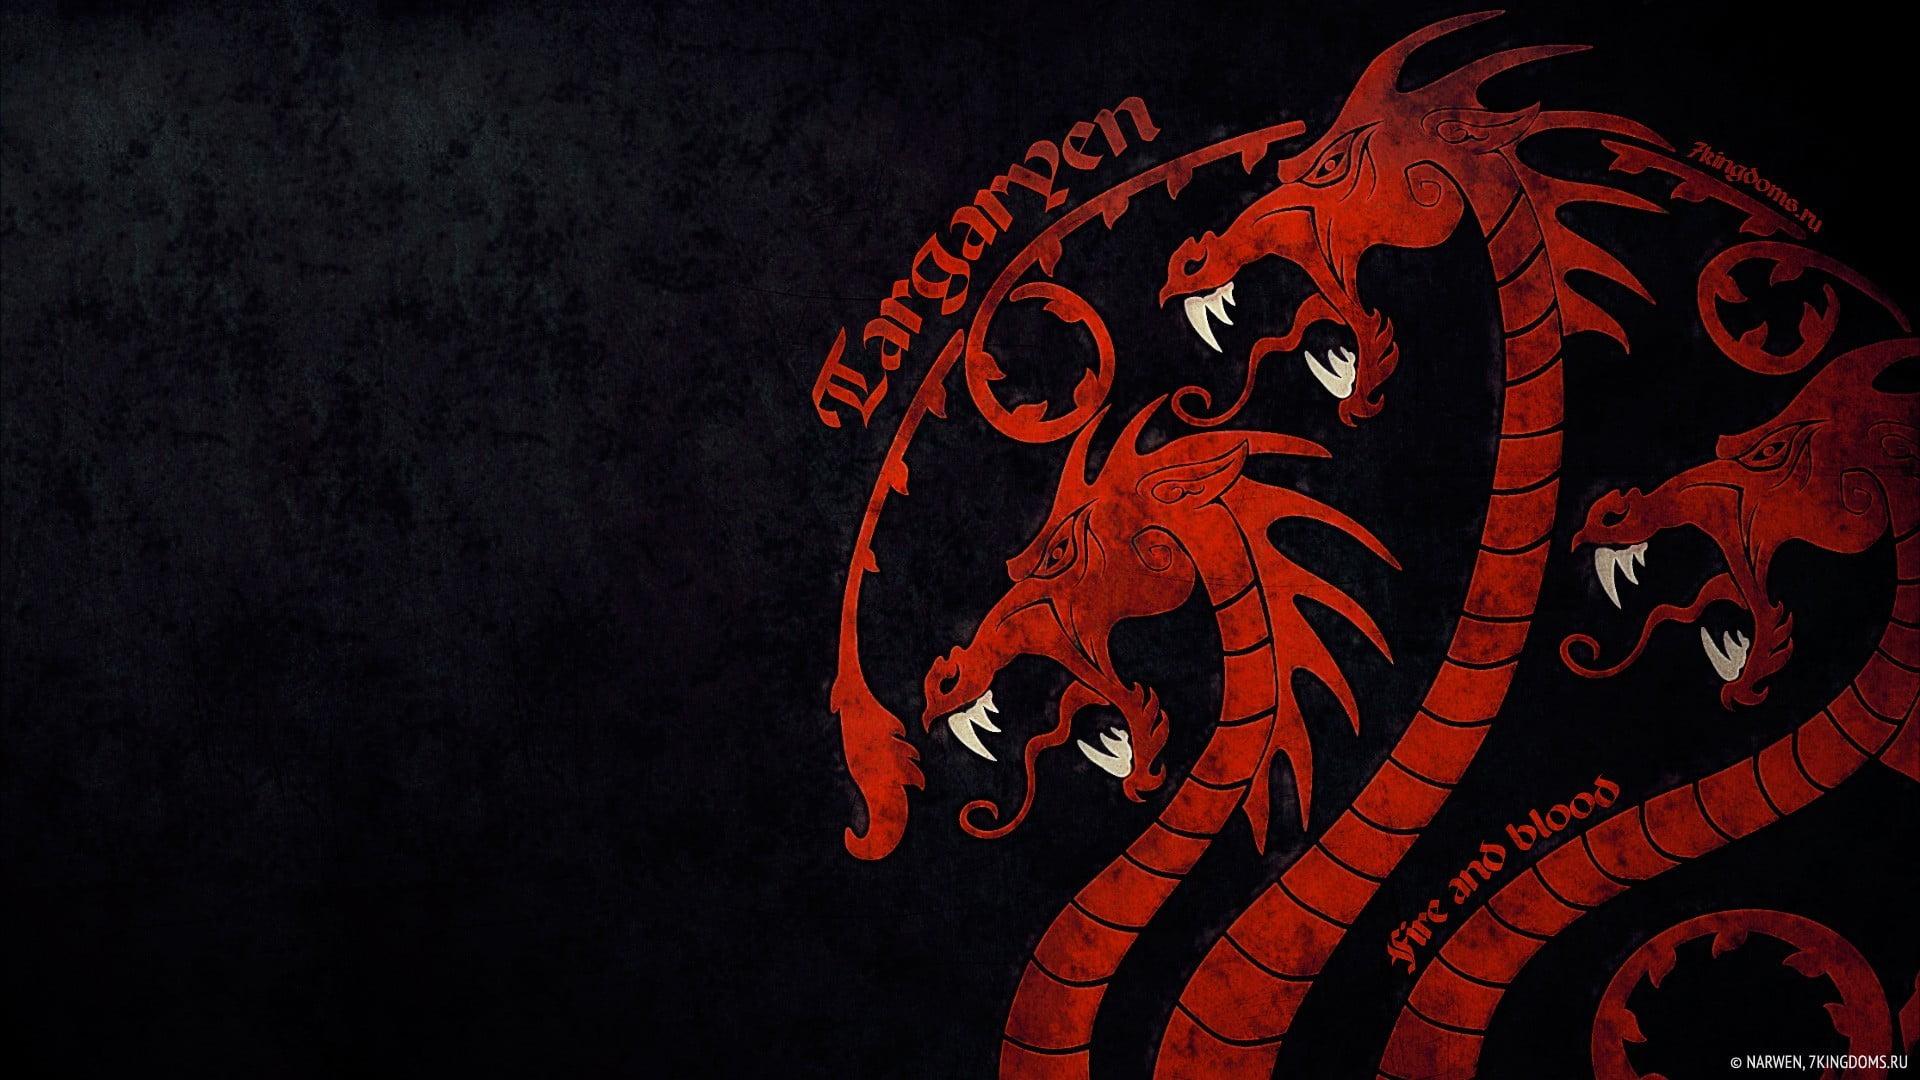 House of Targaryen sigil Game of Thrones House Targaryen fire 1920x1080